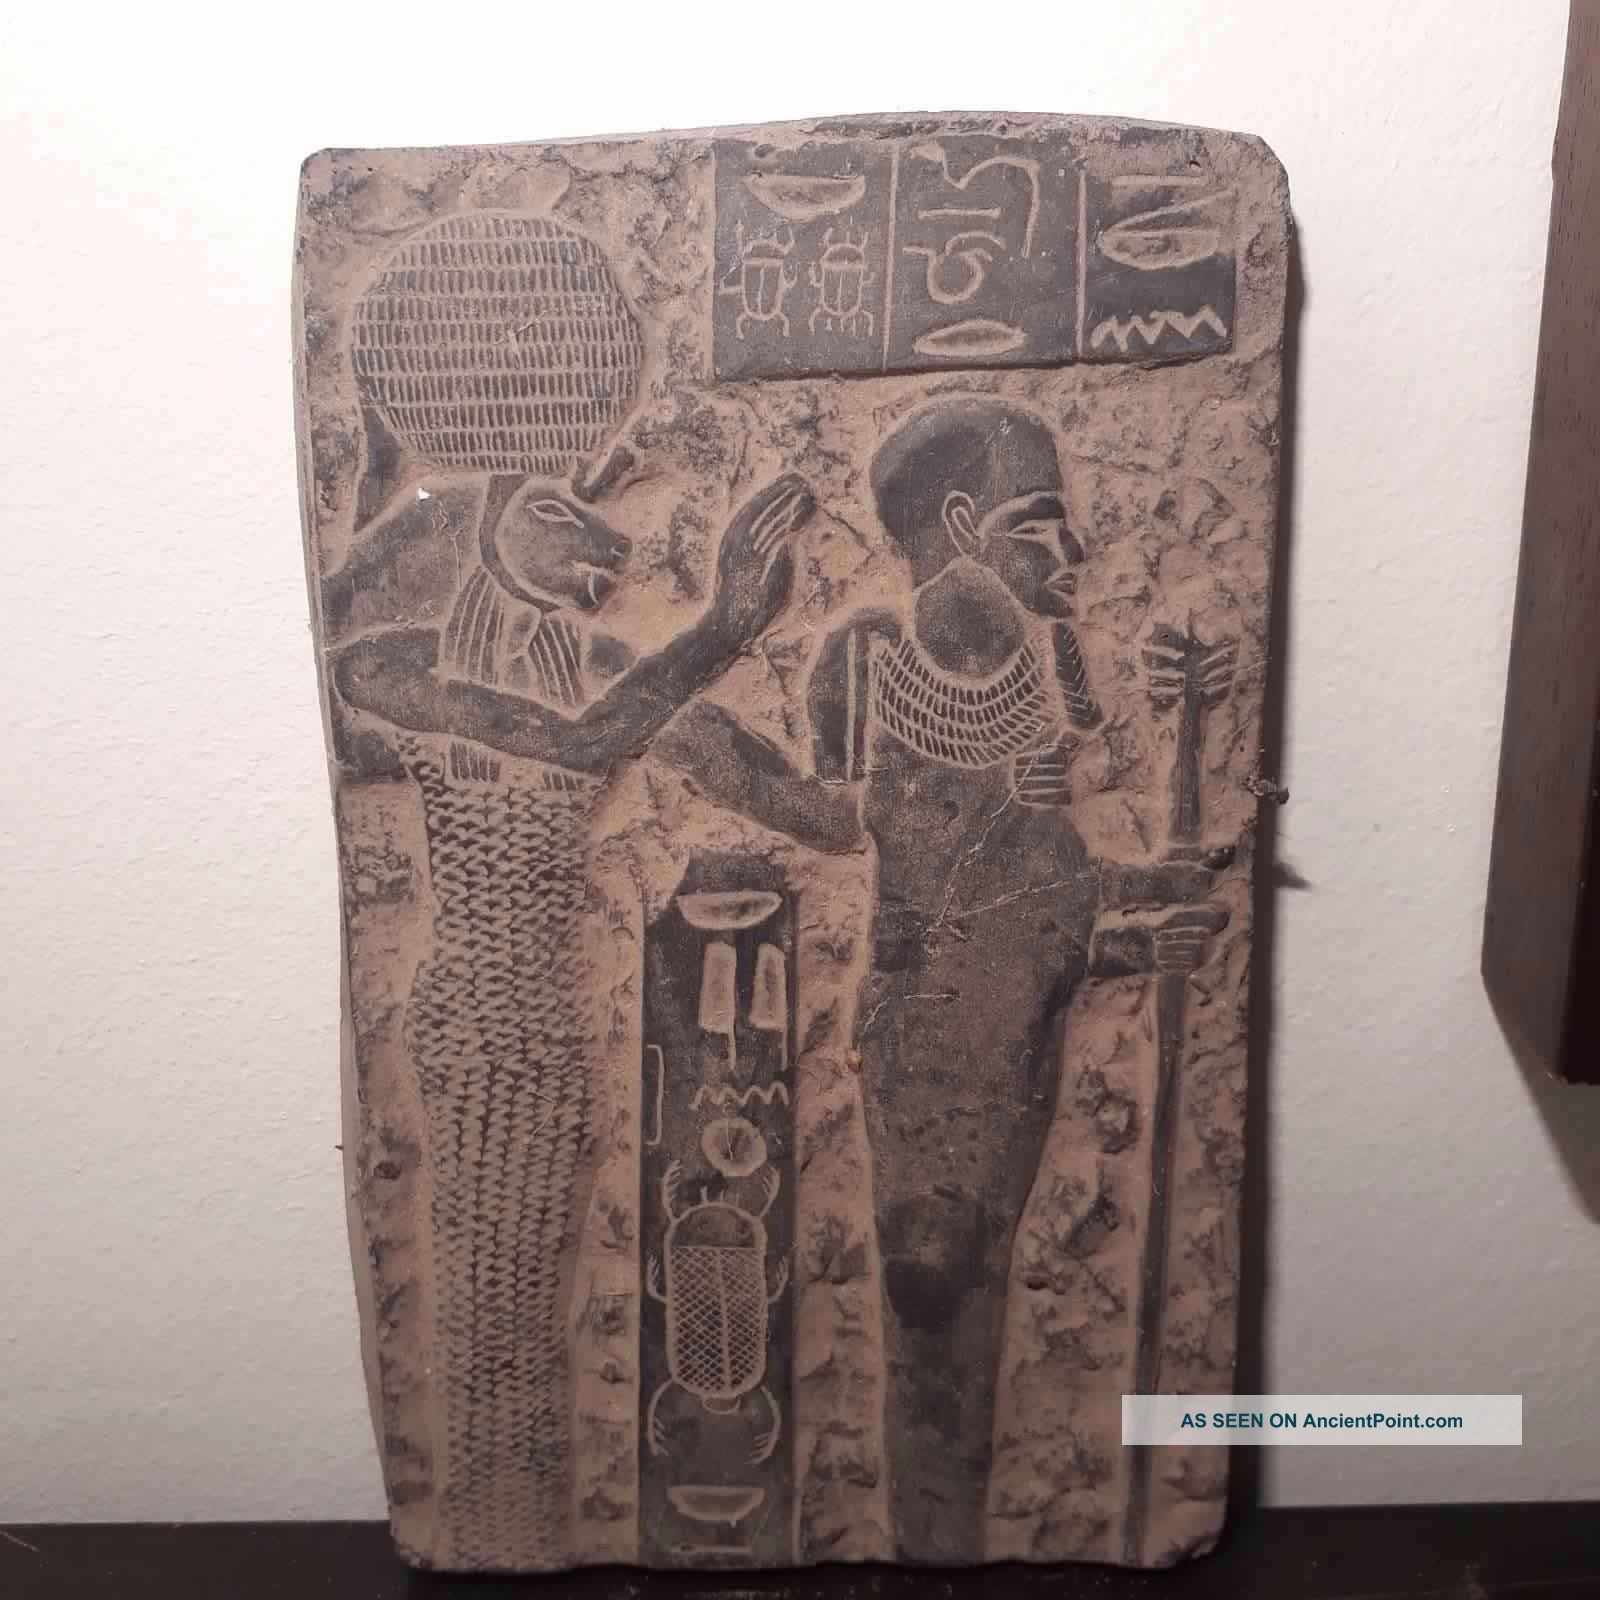 Rare Antique Ancient Egyptian Stela Goddess Sekhmet & God Ptah 1760 - 1680 Bc Egyptian photo